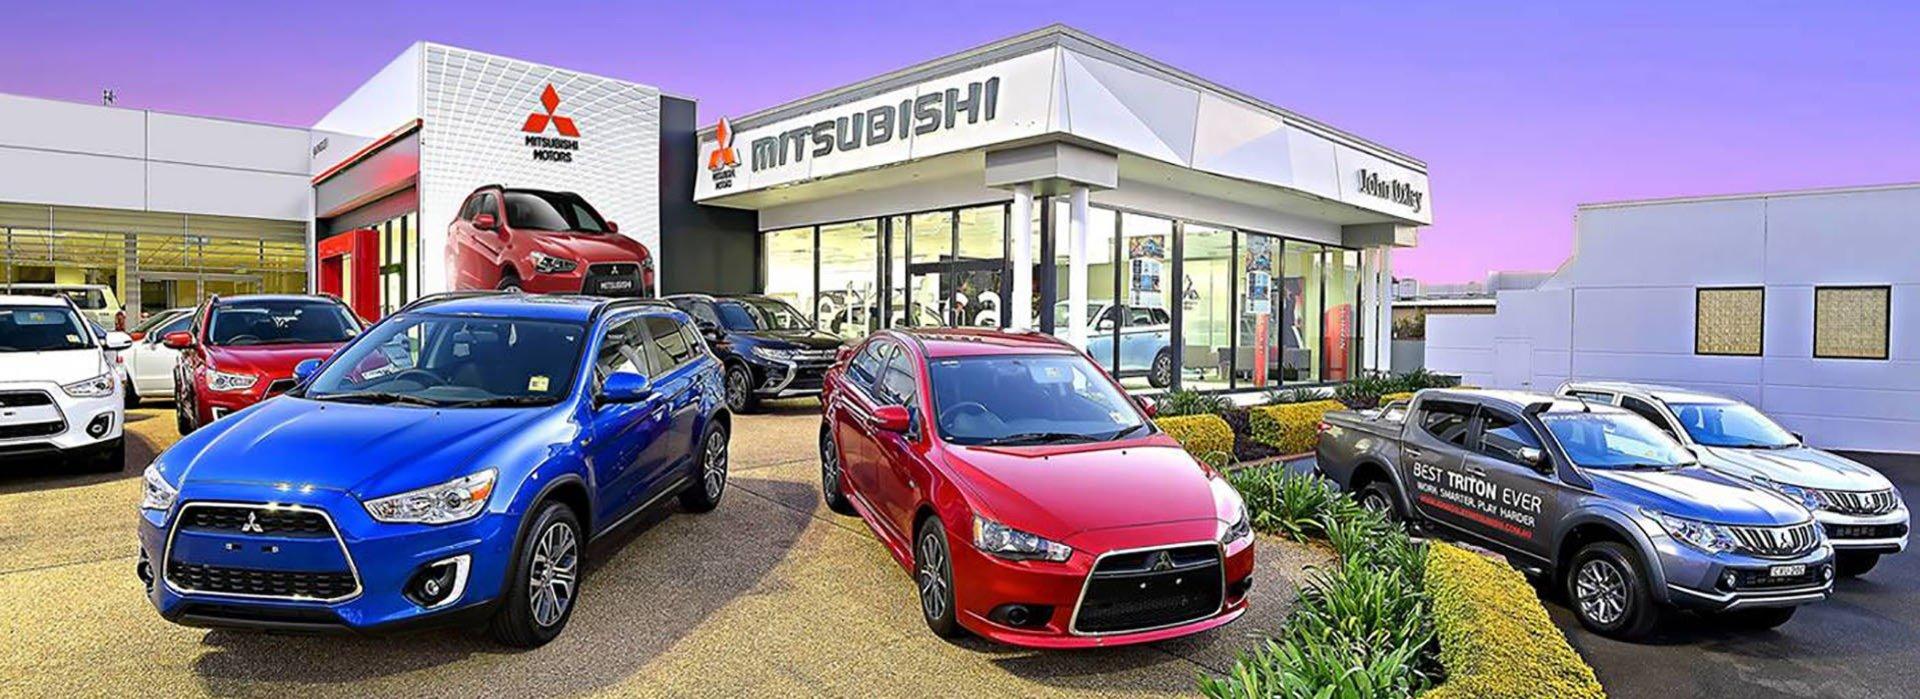 Mitsubishi dealer Port Macquarie NSW - John Oxley Mitsubishi